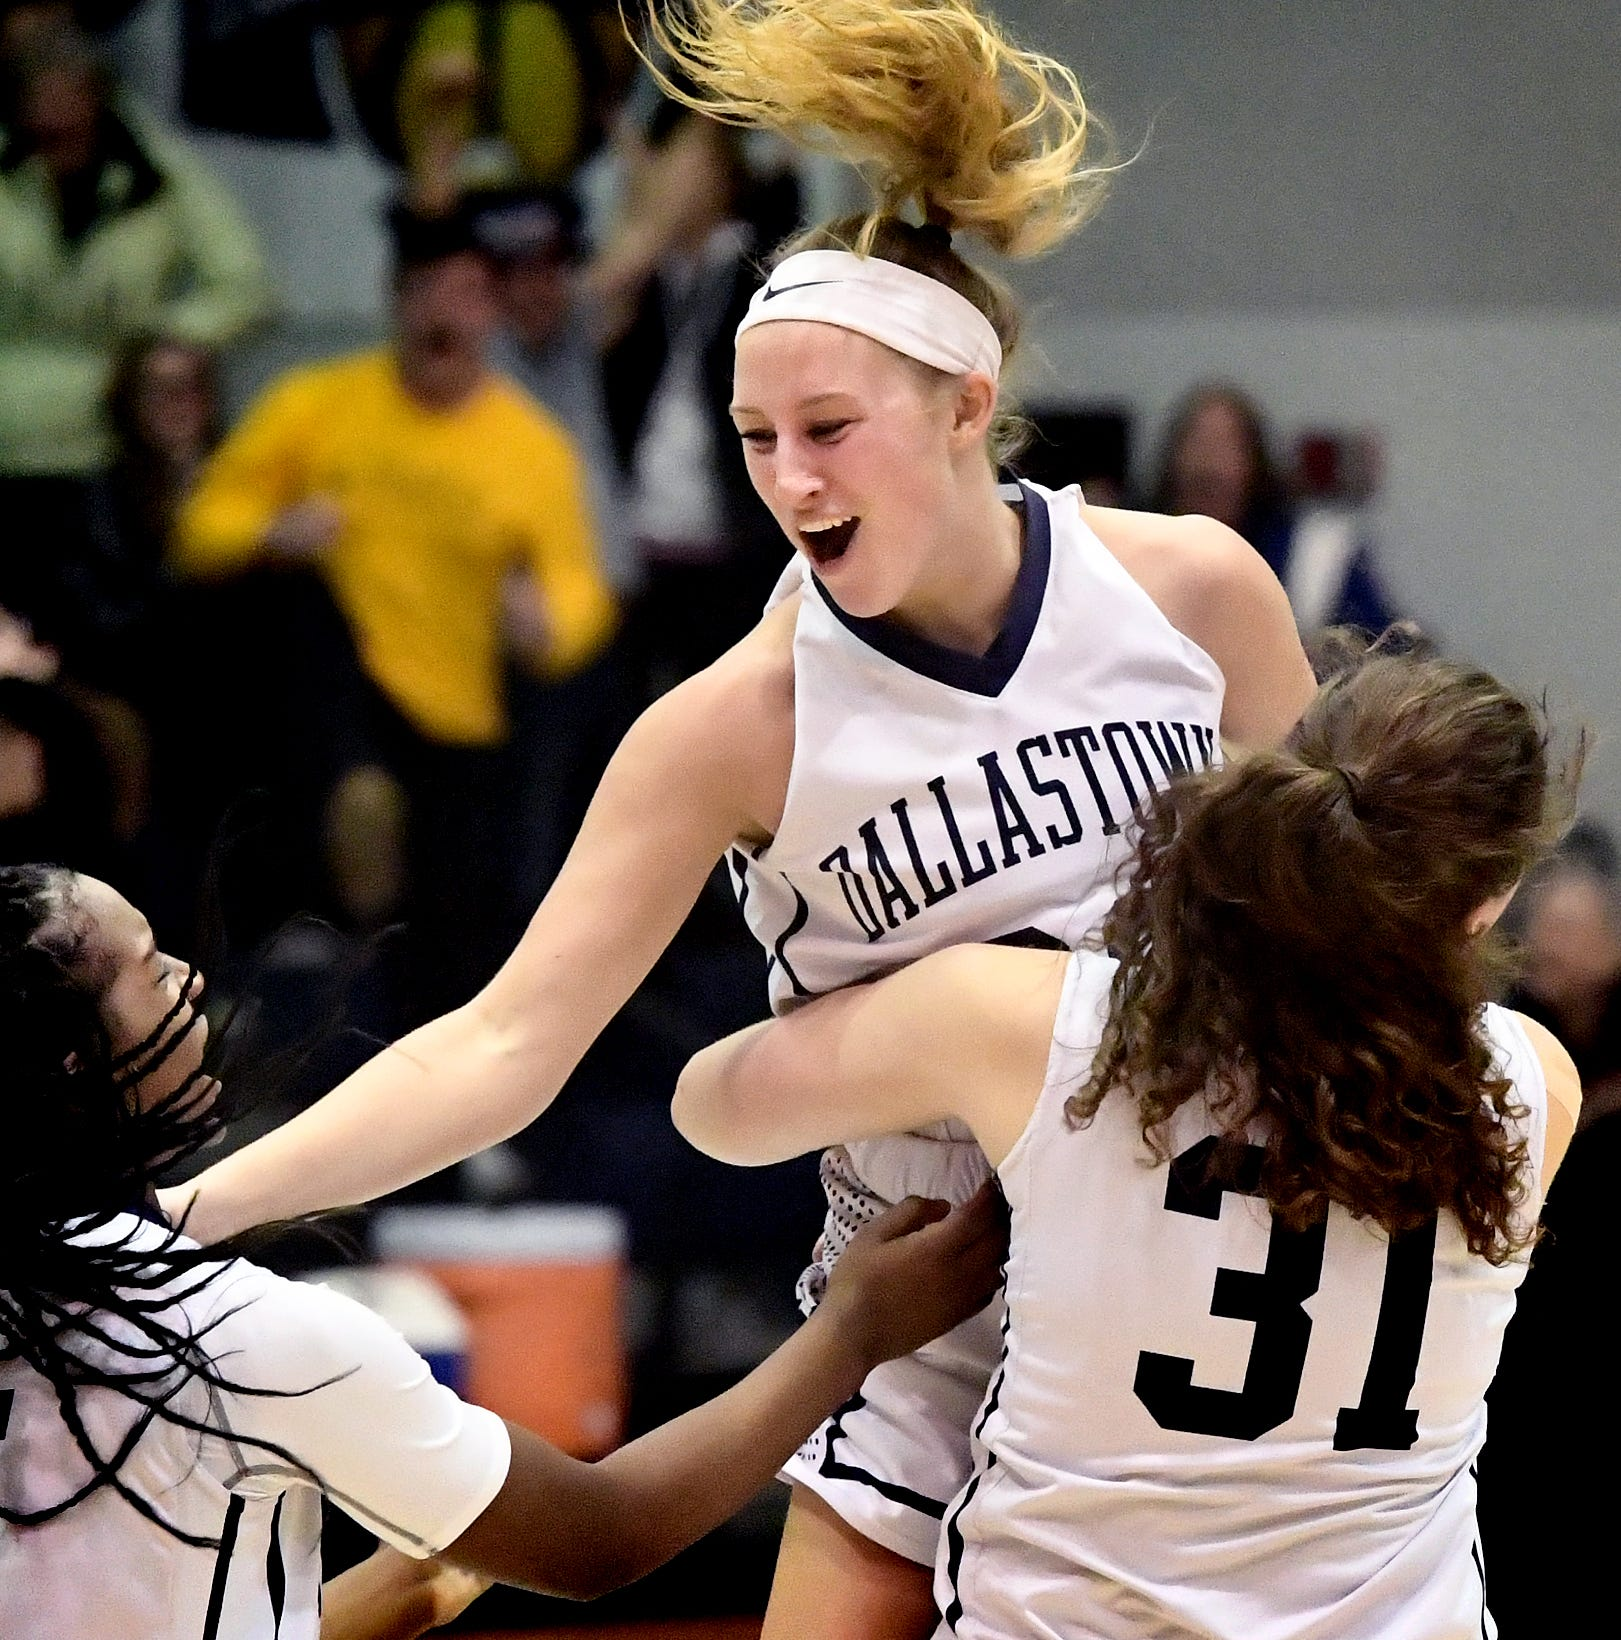 PREP ROUNDUP, TUESDAY, JAN. 22: Jamison's jumper gives Dallastown girls key triple-OT win